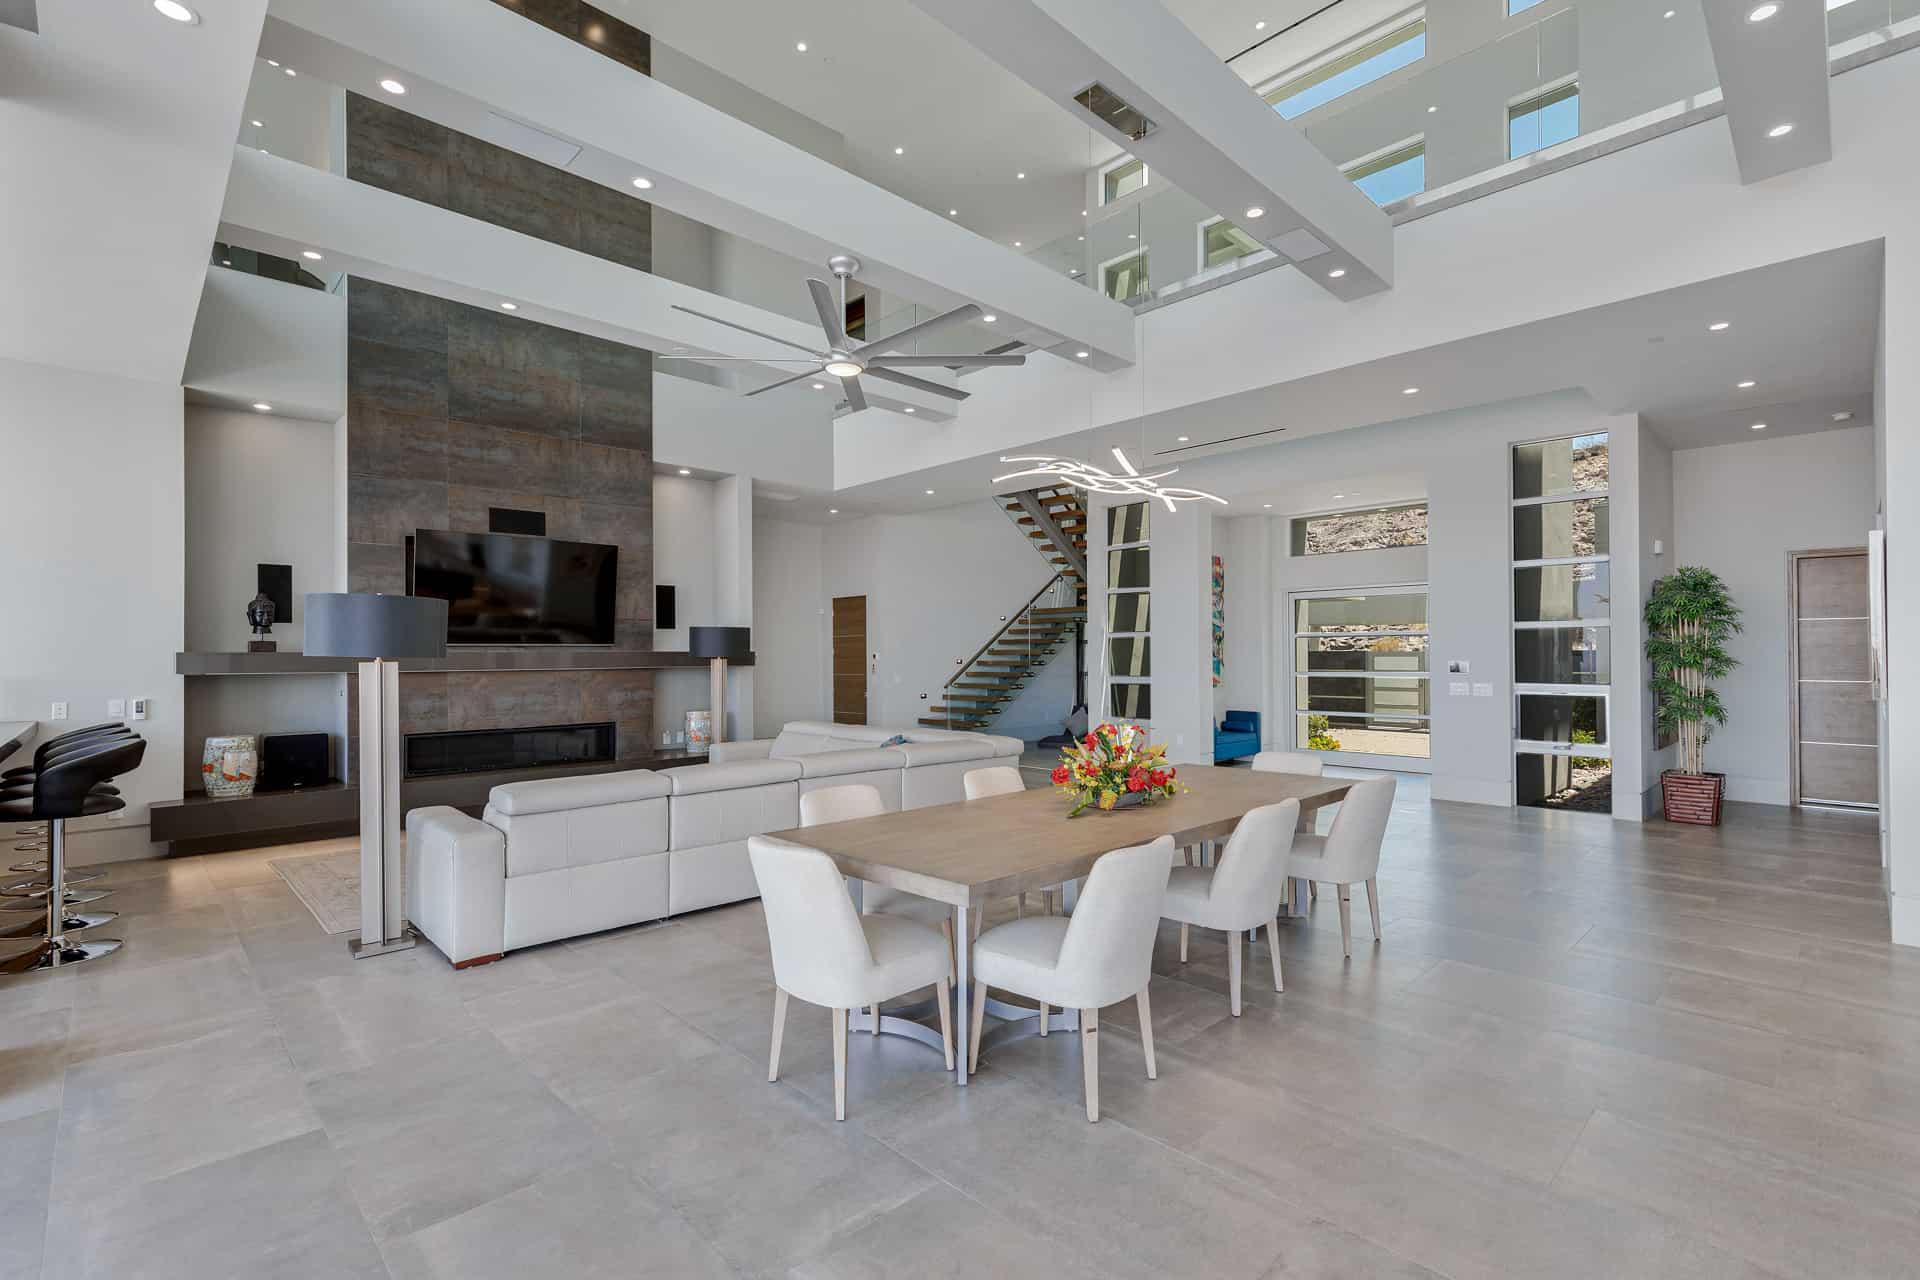 las-vegas-luxry-real-estate-realtor-rob-jensen-company-5-rockstream-drive-ascaya029